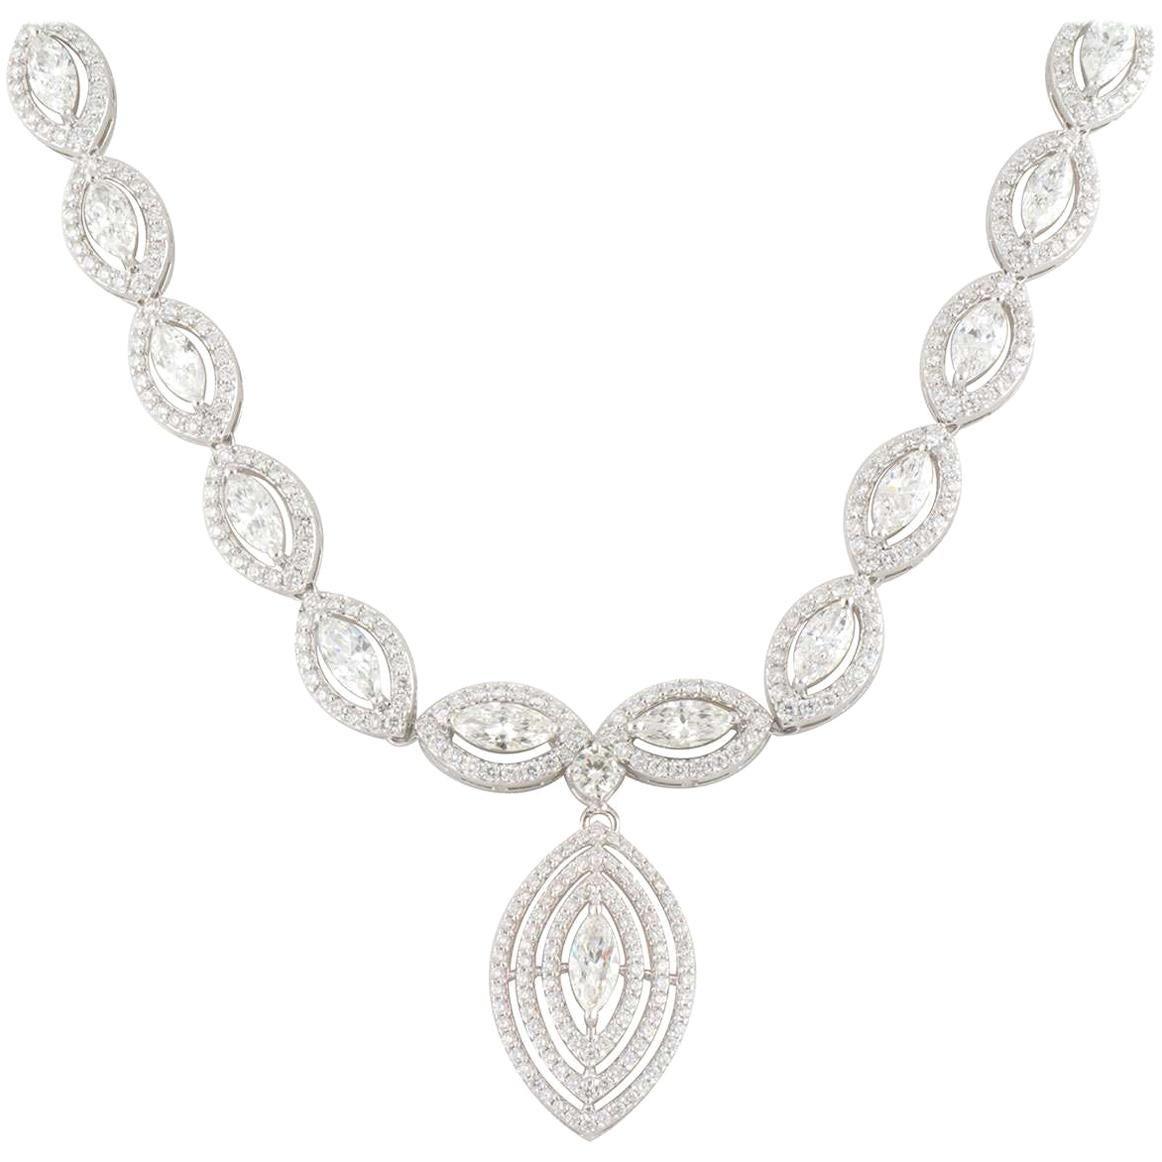 White Gold Marquise Cut Diamond Drop Necklace 14.37 Carat